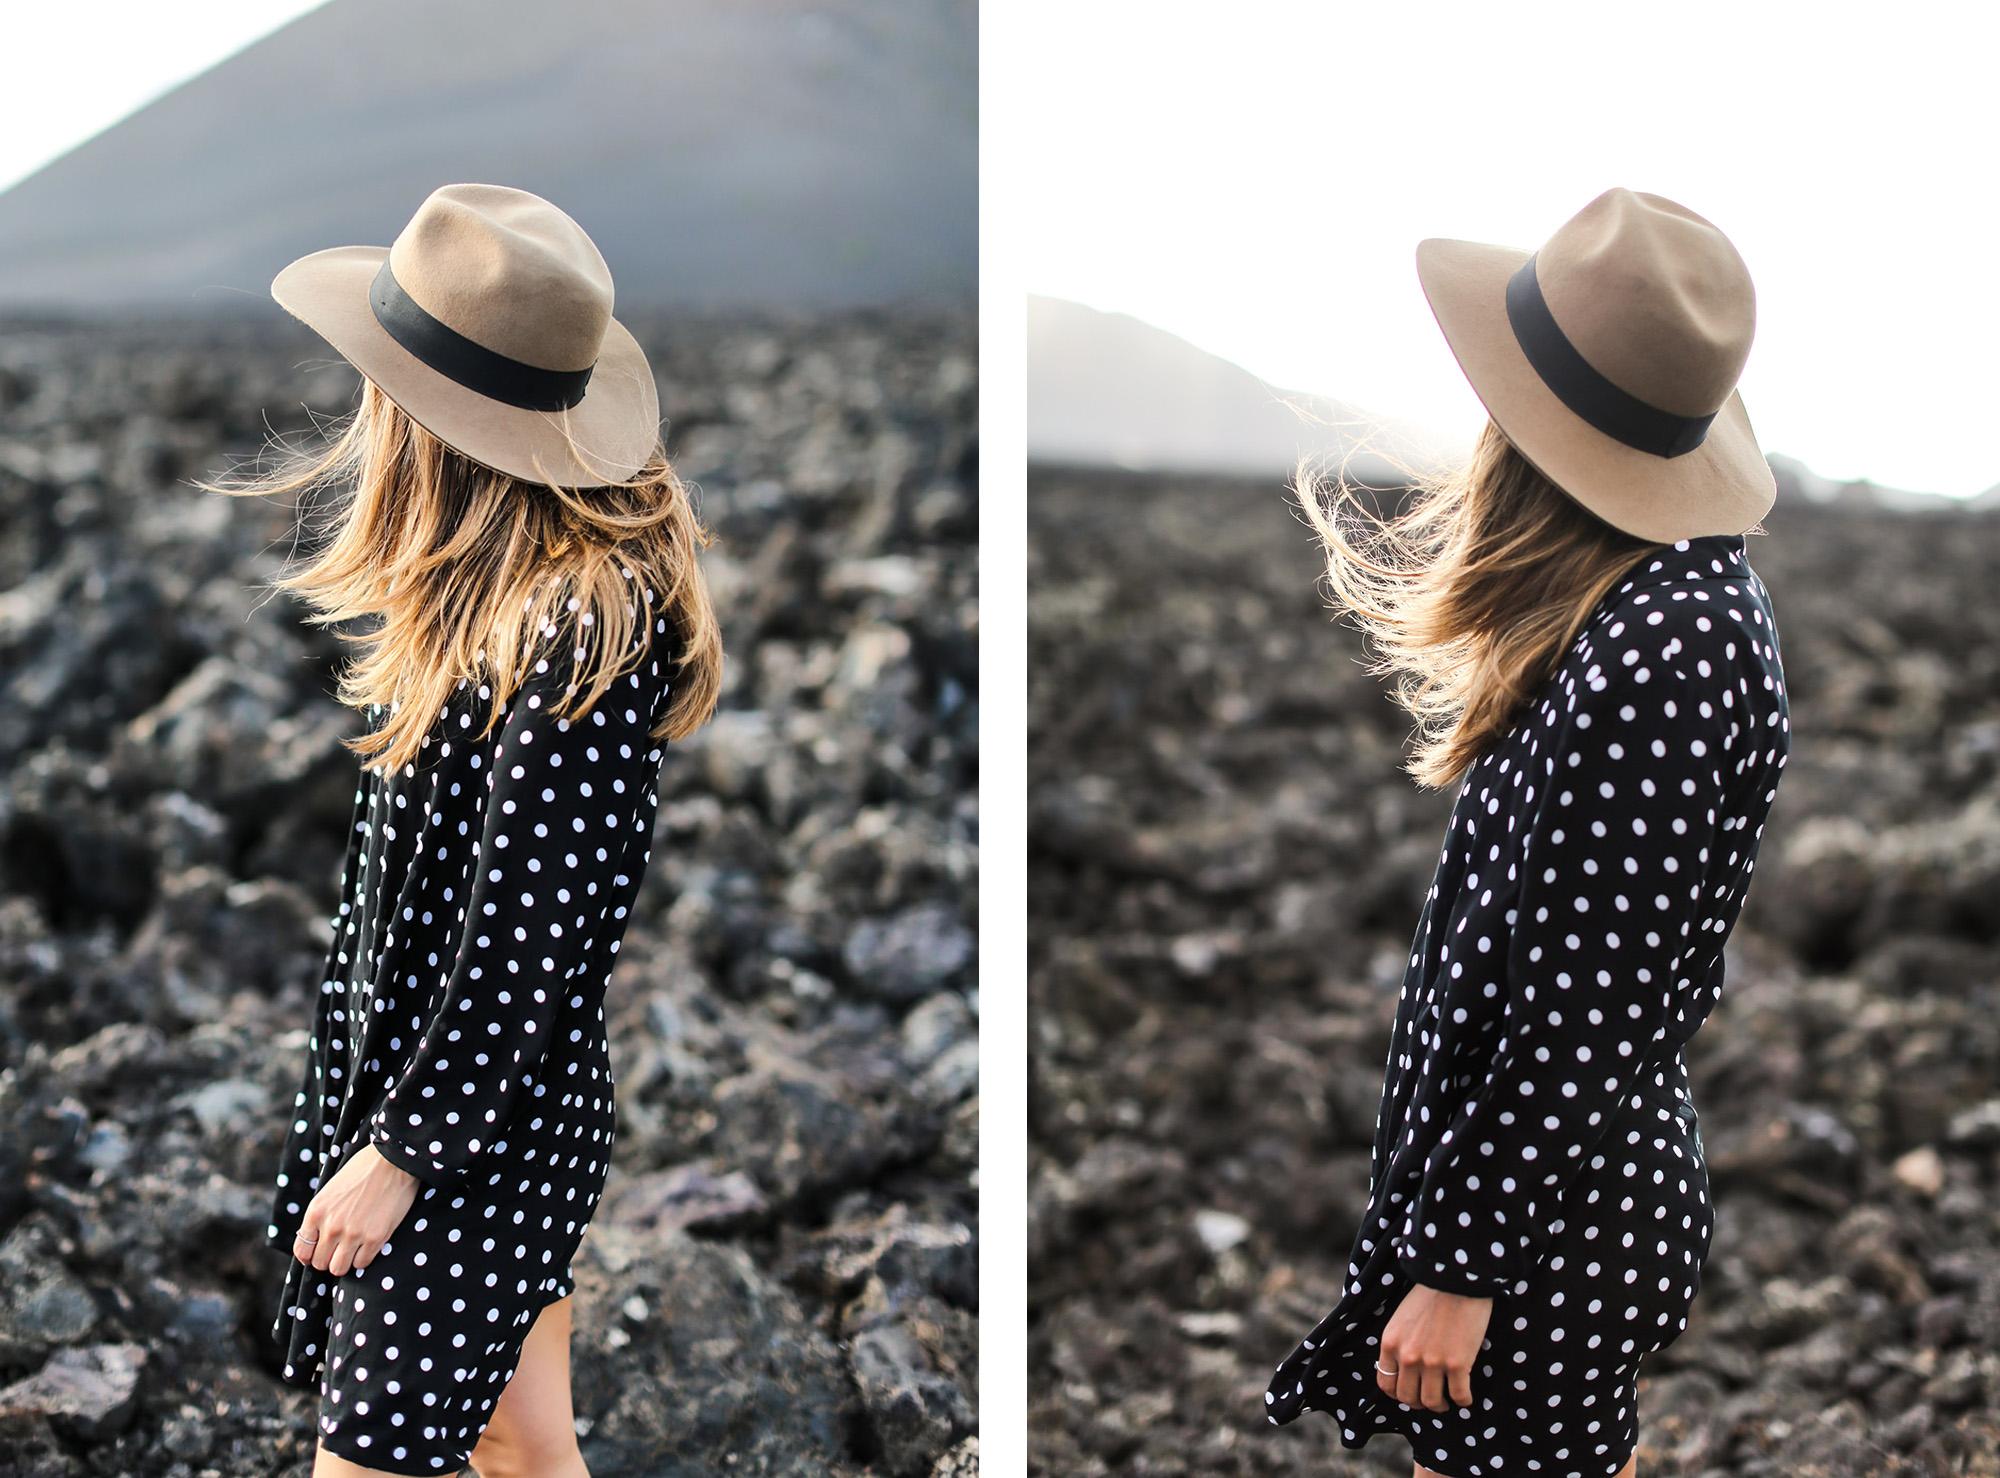 Clochet_streetstyle_fashionblogger_lanzarote_lasanta_elquemao_minivestidolunareszara-10